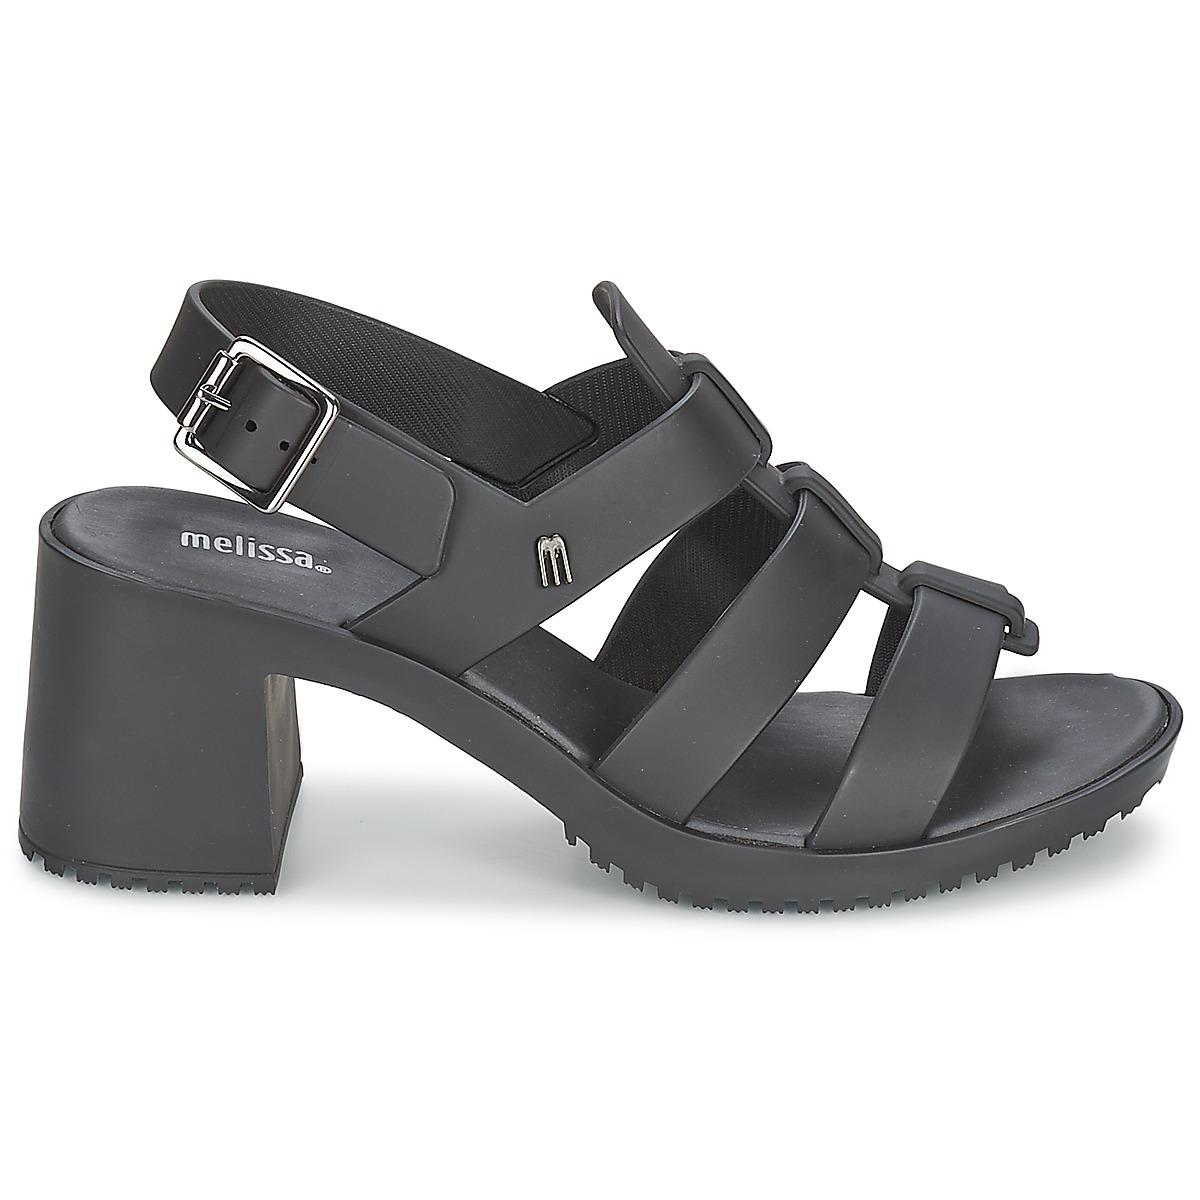 9e17c2b14944 Melissa - Flox High Women s Sandals In Black - Lyst. View fullscreen